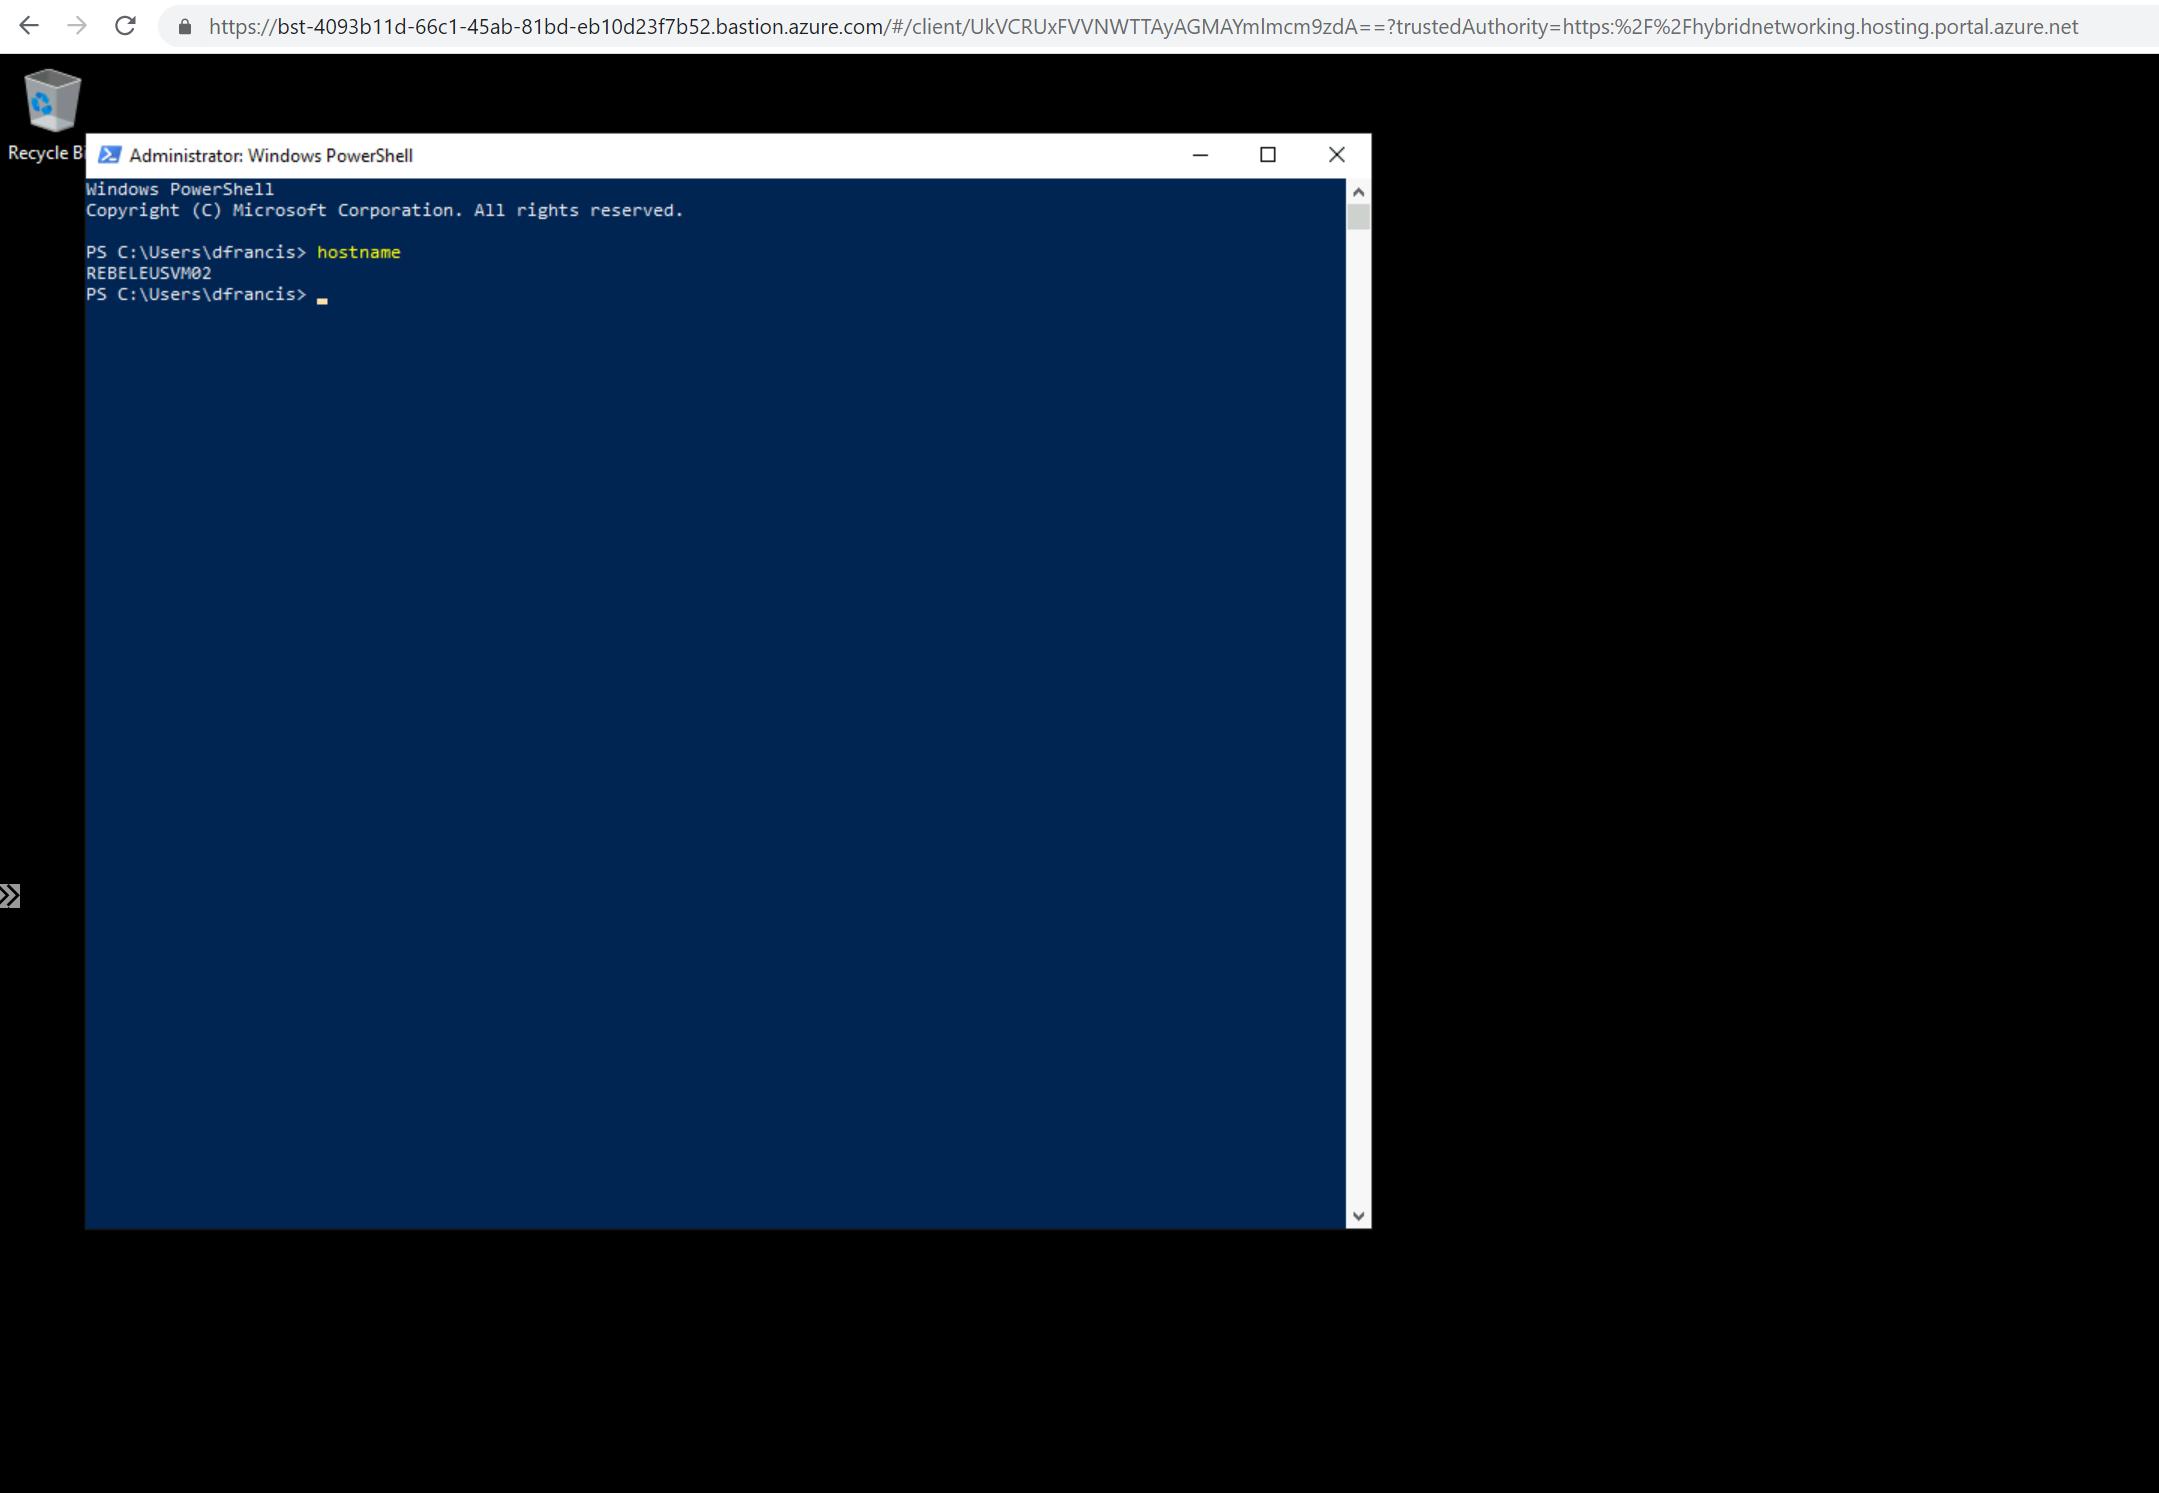 Verify Azure Bastion connection to REBELEUSVM02